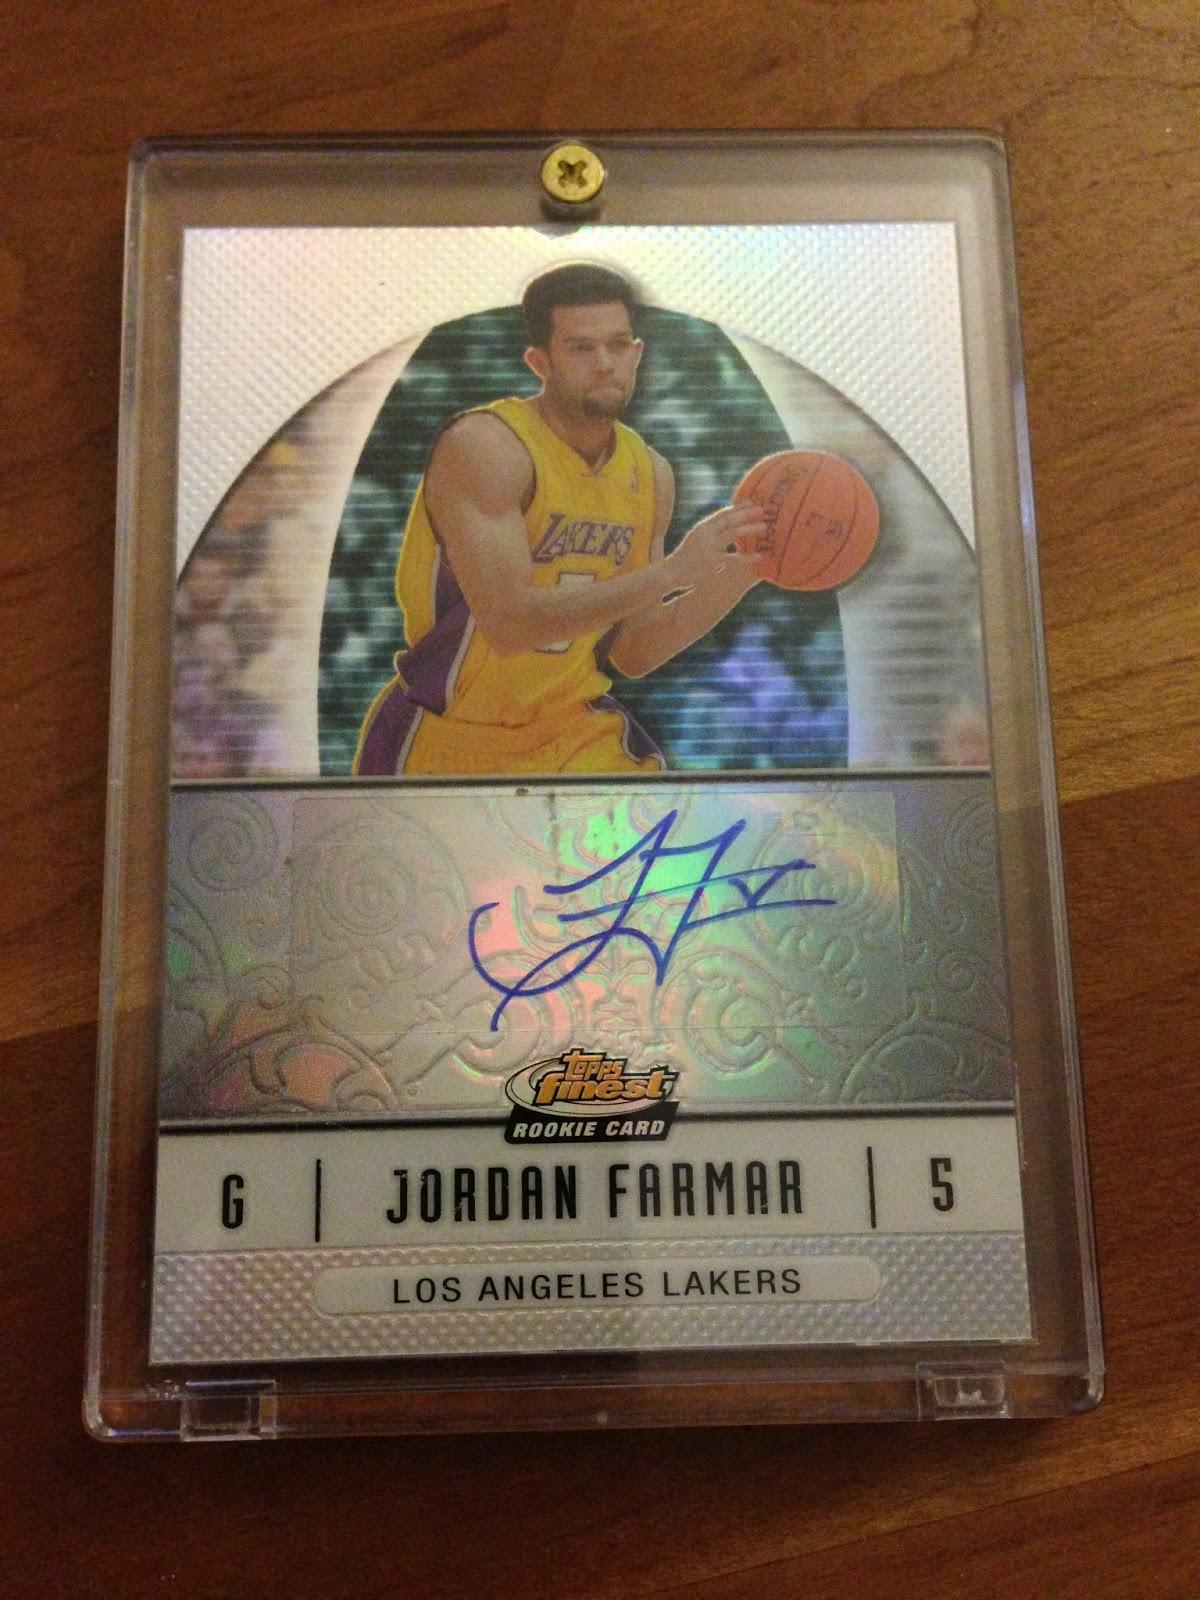 Jordan Farmar Rookie Autograph auto card free sweepstakes los angeles lakers NBA